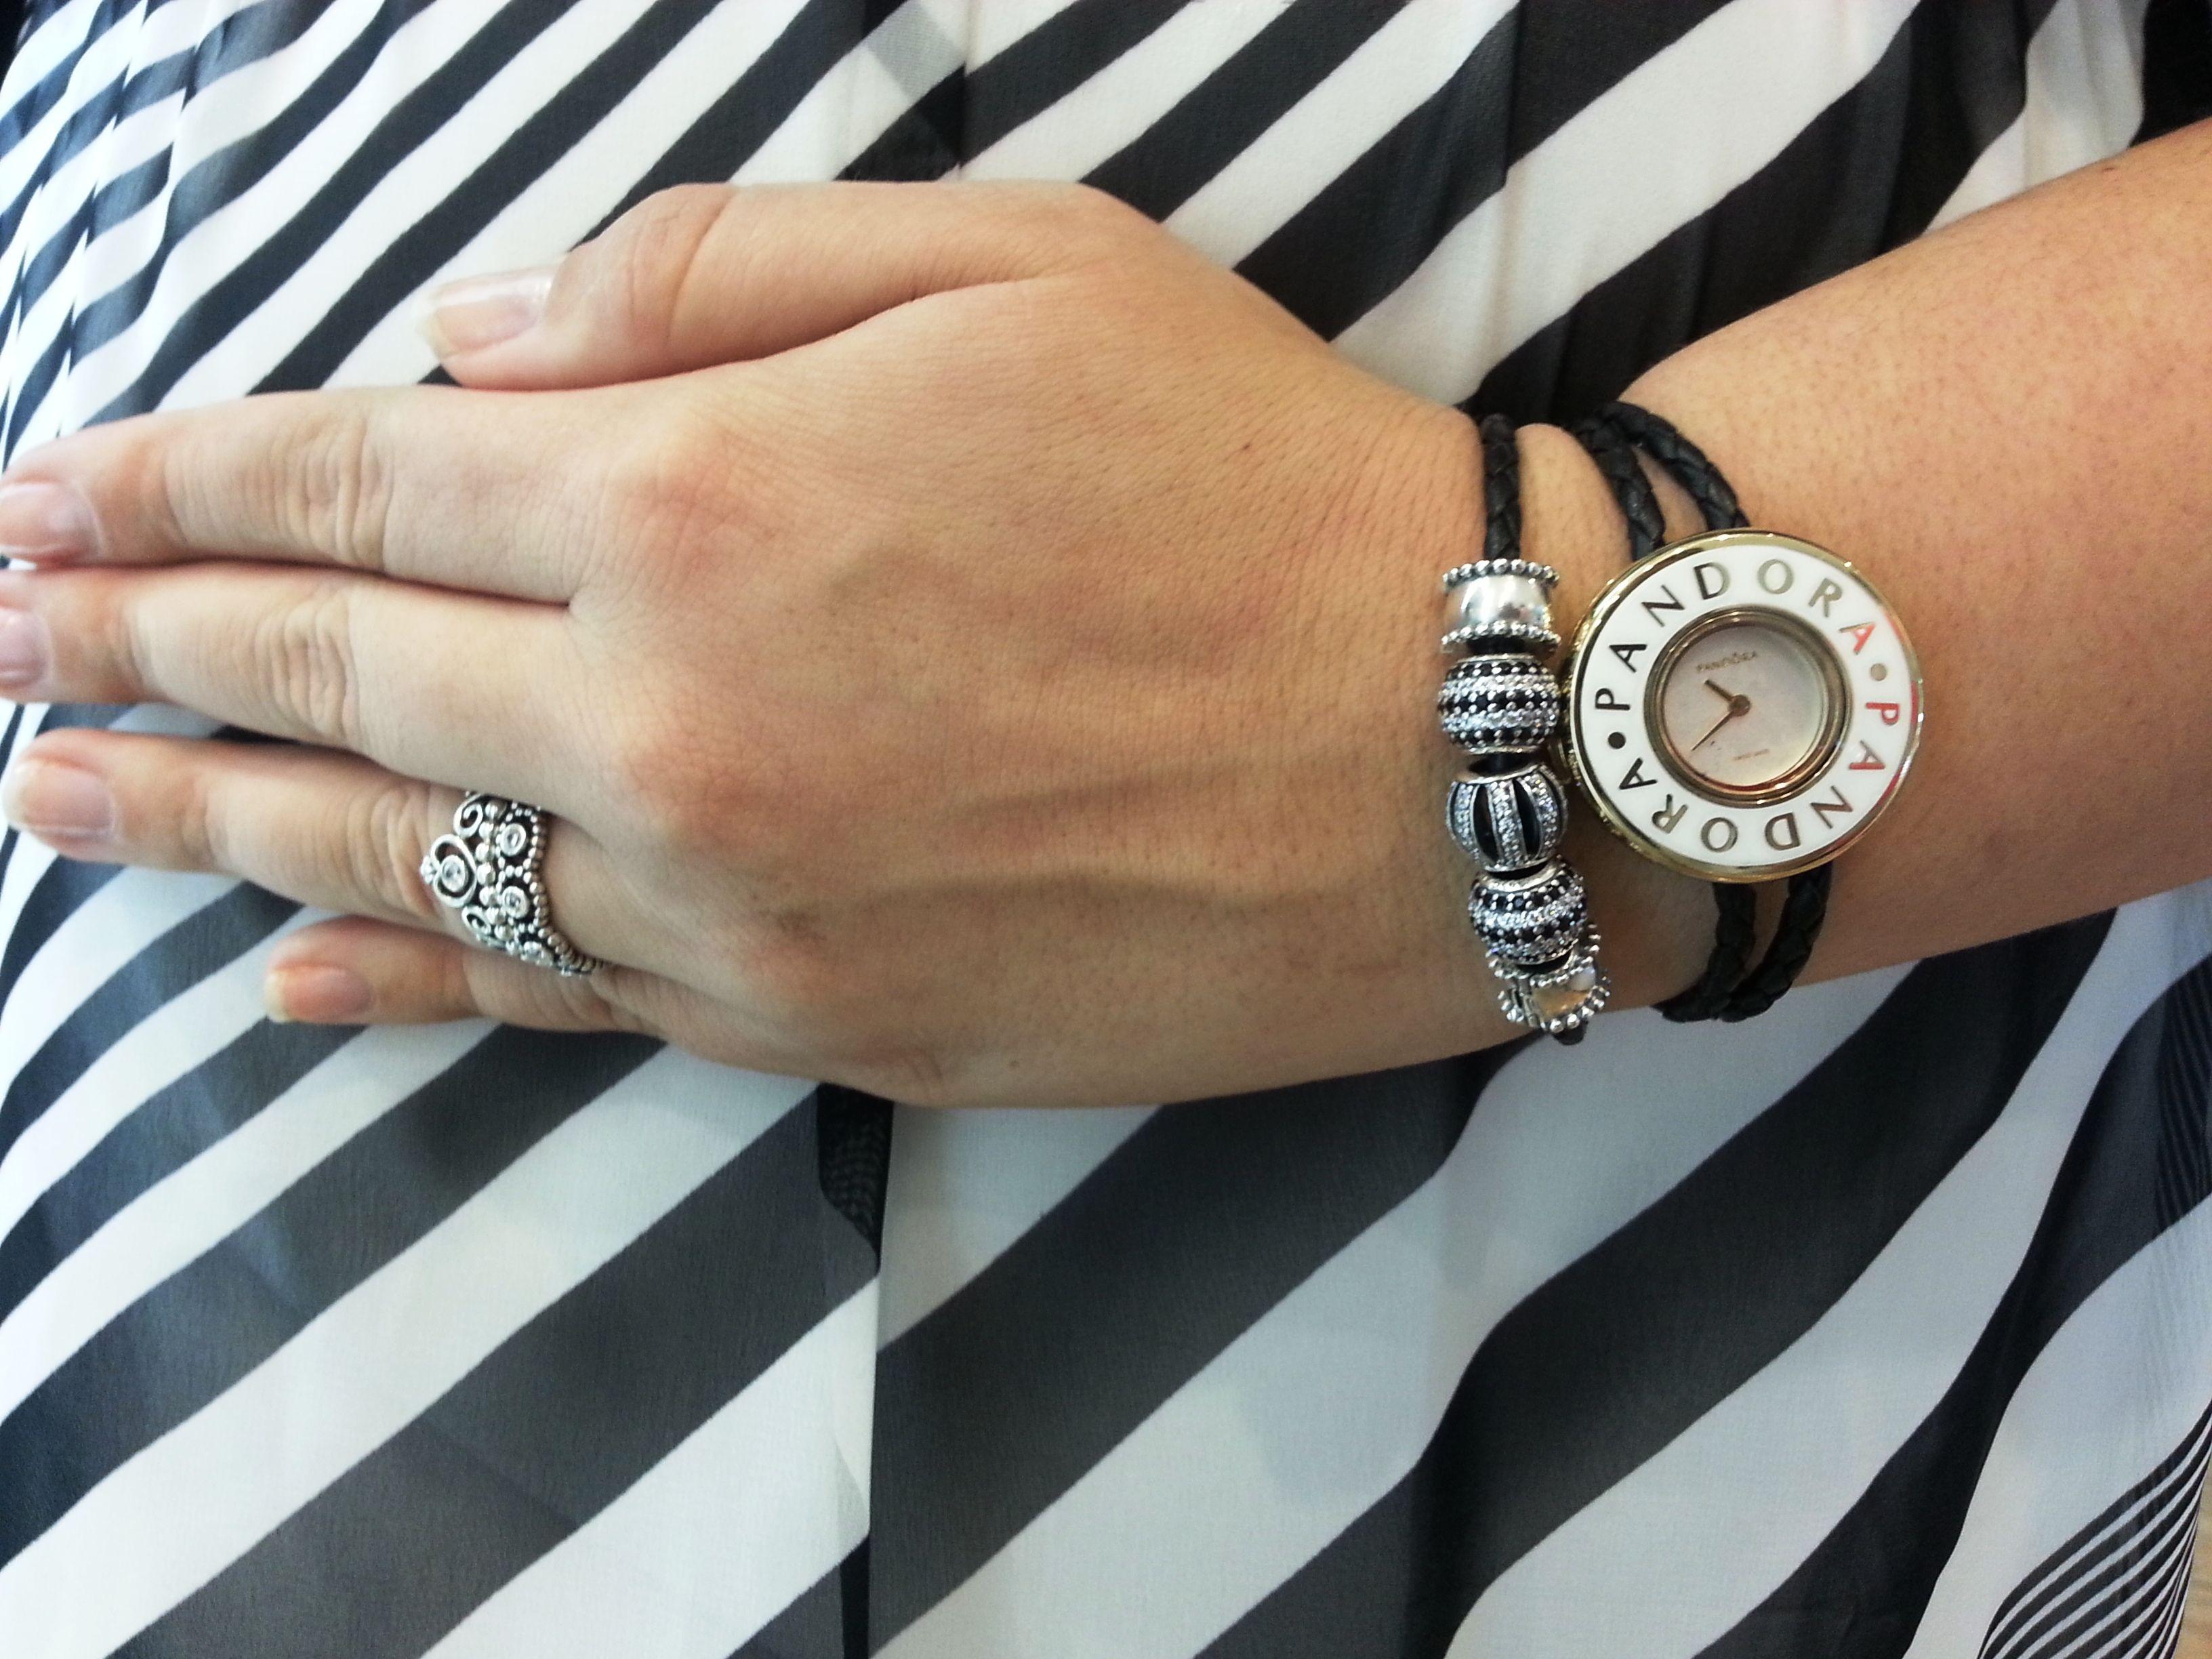 Pandora bracelet dillards -  Pandoracrabtreeloves The Leather Bracelet Watches Pandoraloves